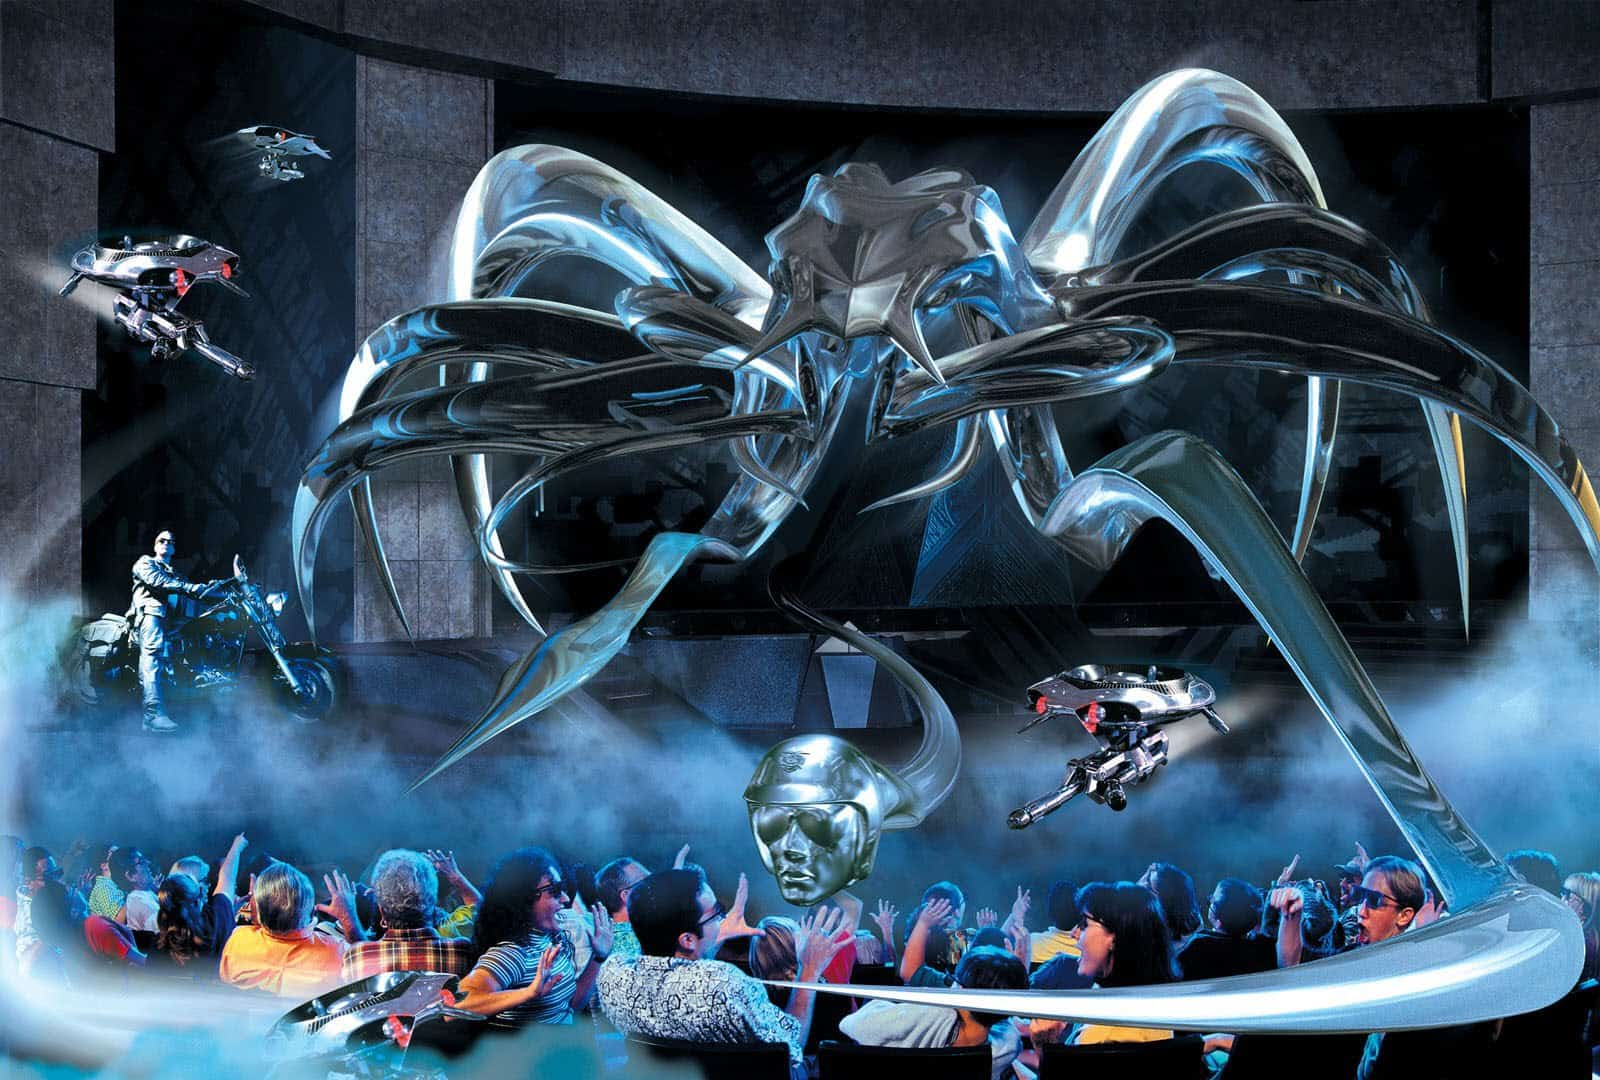 Wallpaper Chucky 3d Terminator 2 3d Closing For A New Attraction